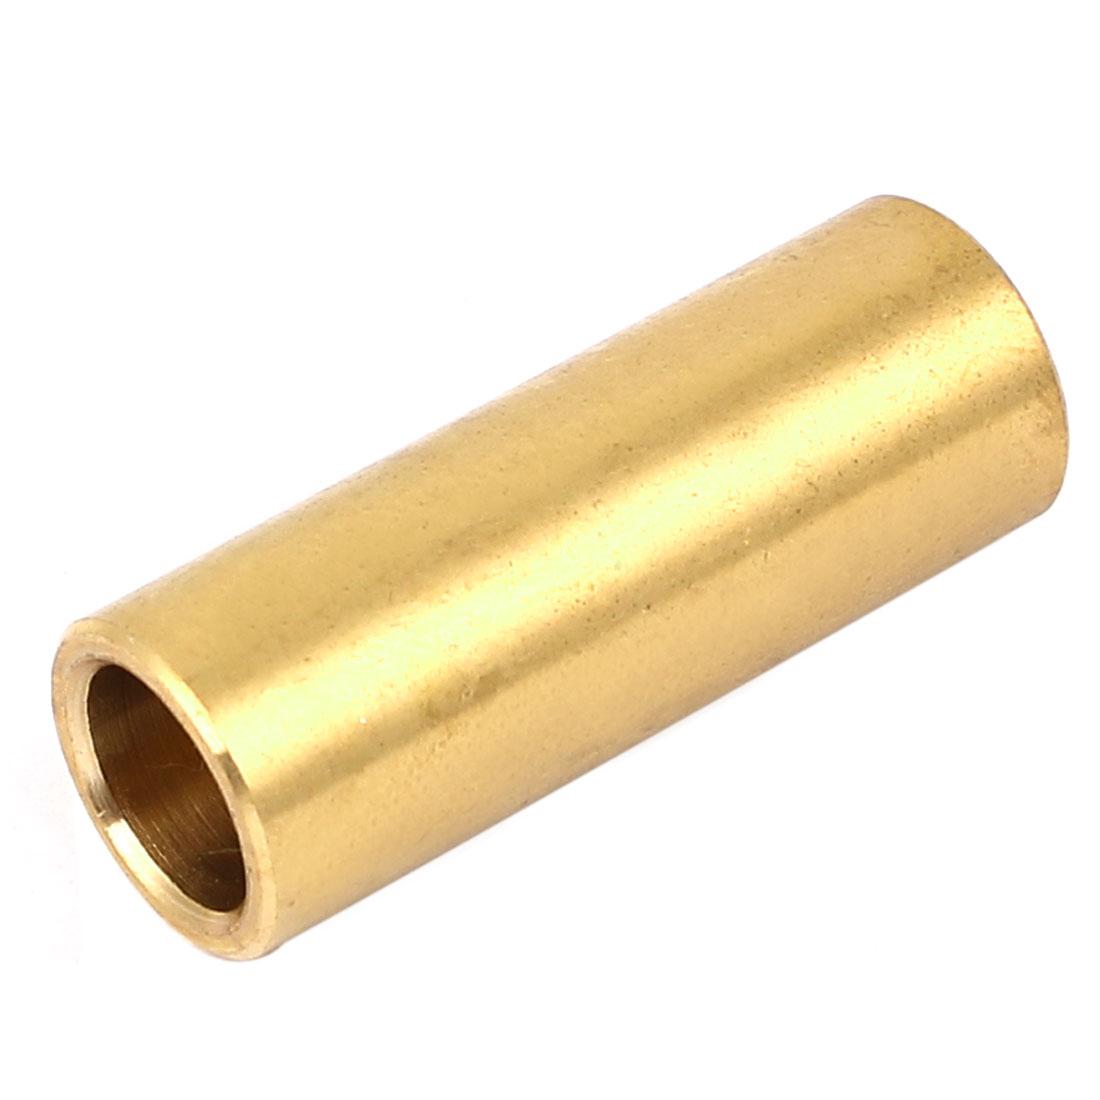 11mm x 8mm x 30mm Self-lubricating Copper Bushing Bearing Sleeve